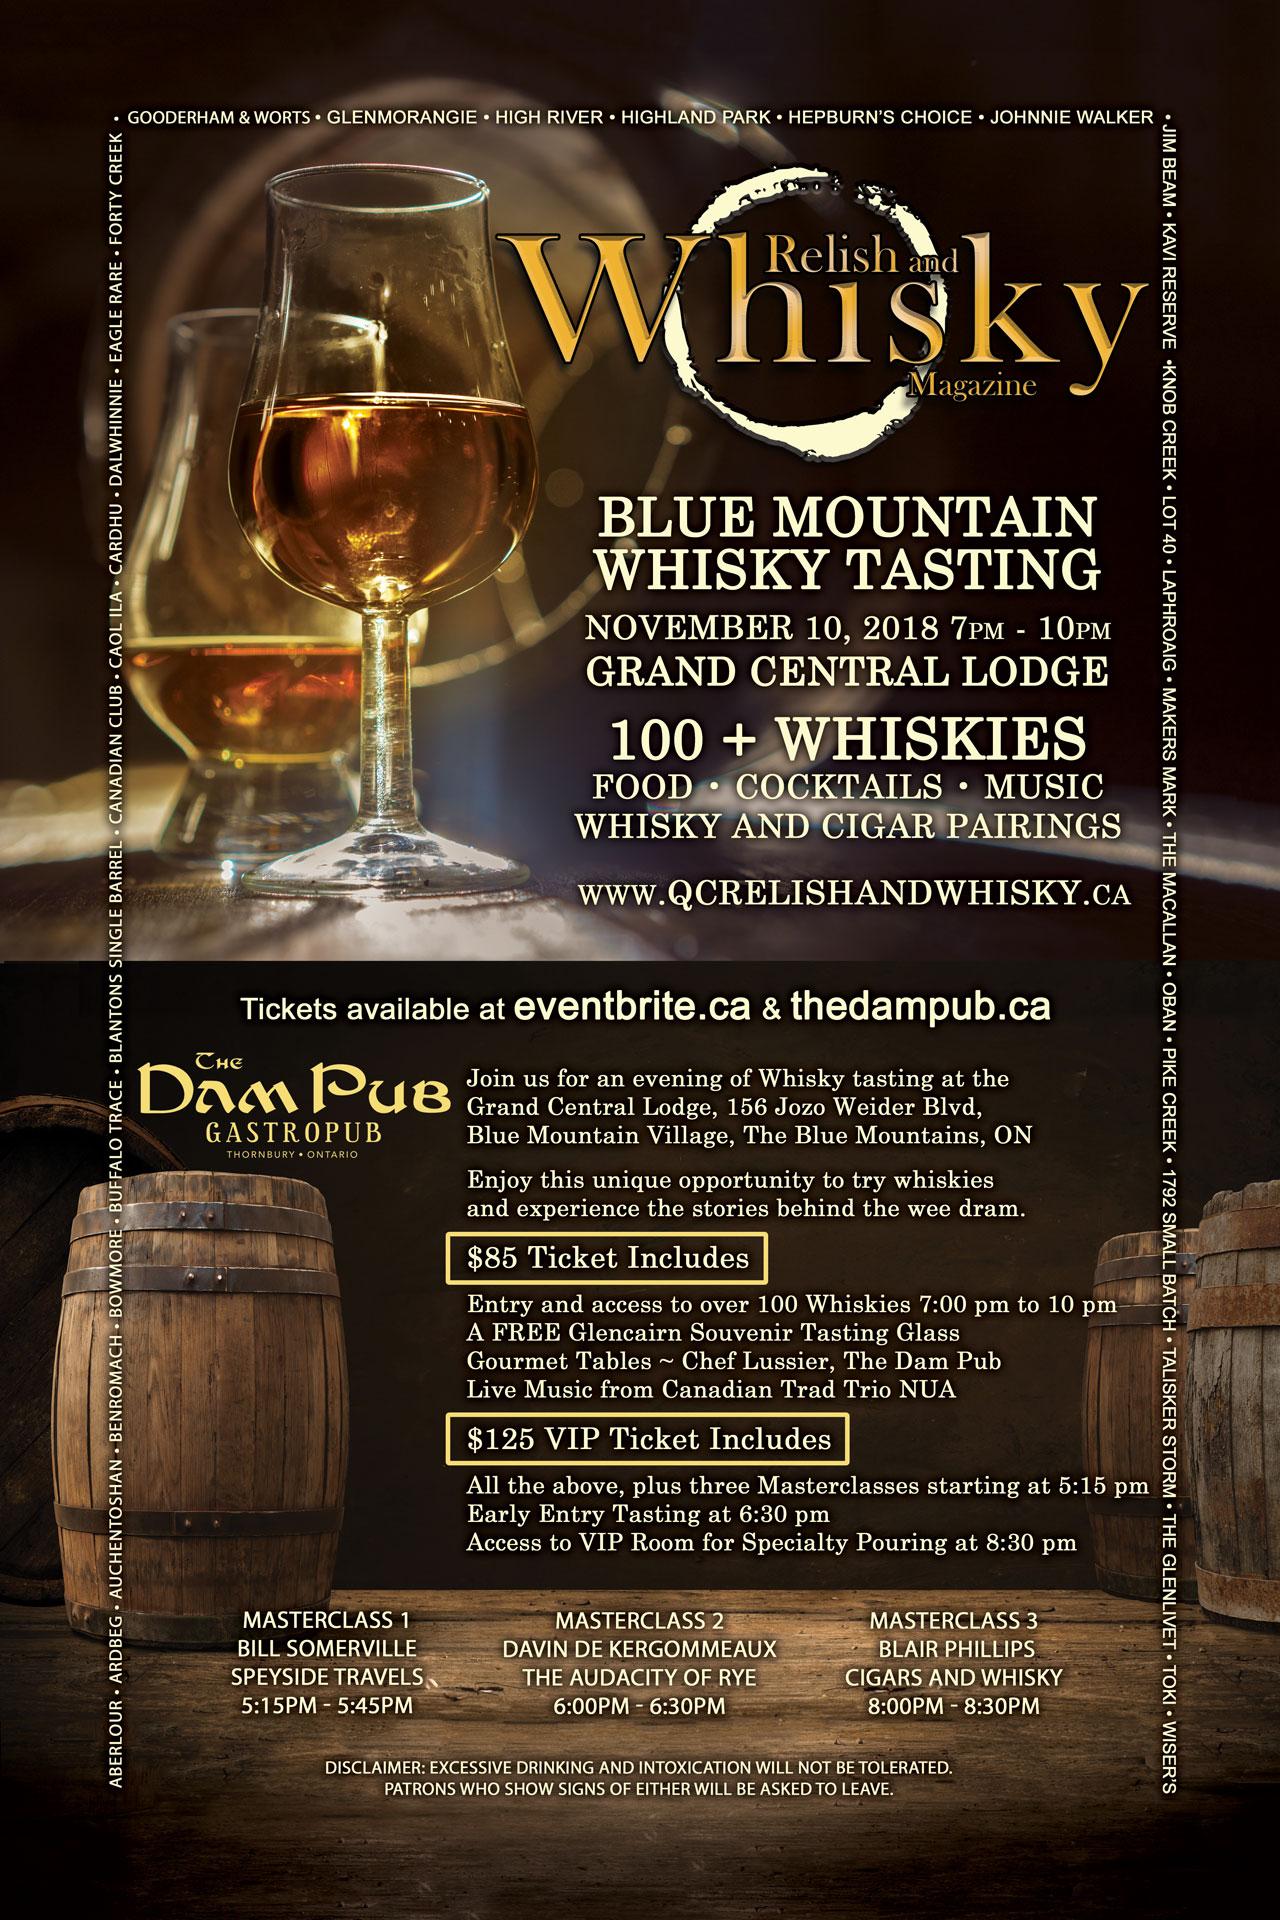 Blue Mountain Whisky Tasting